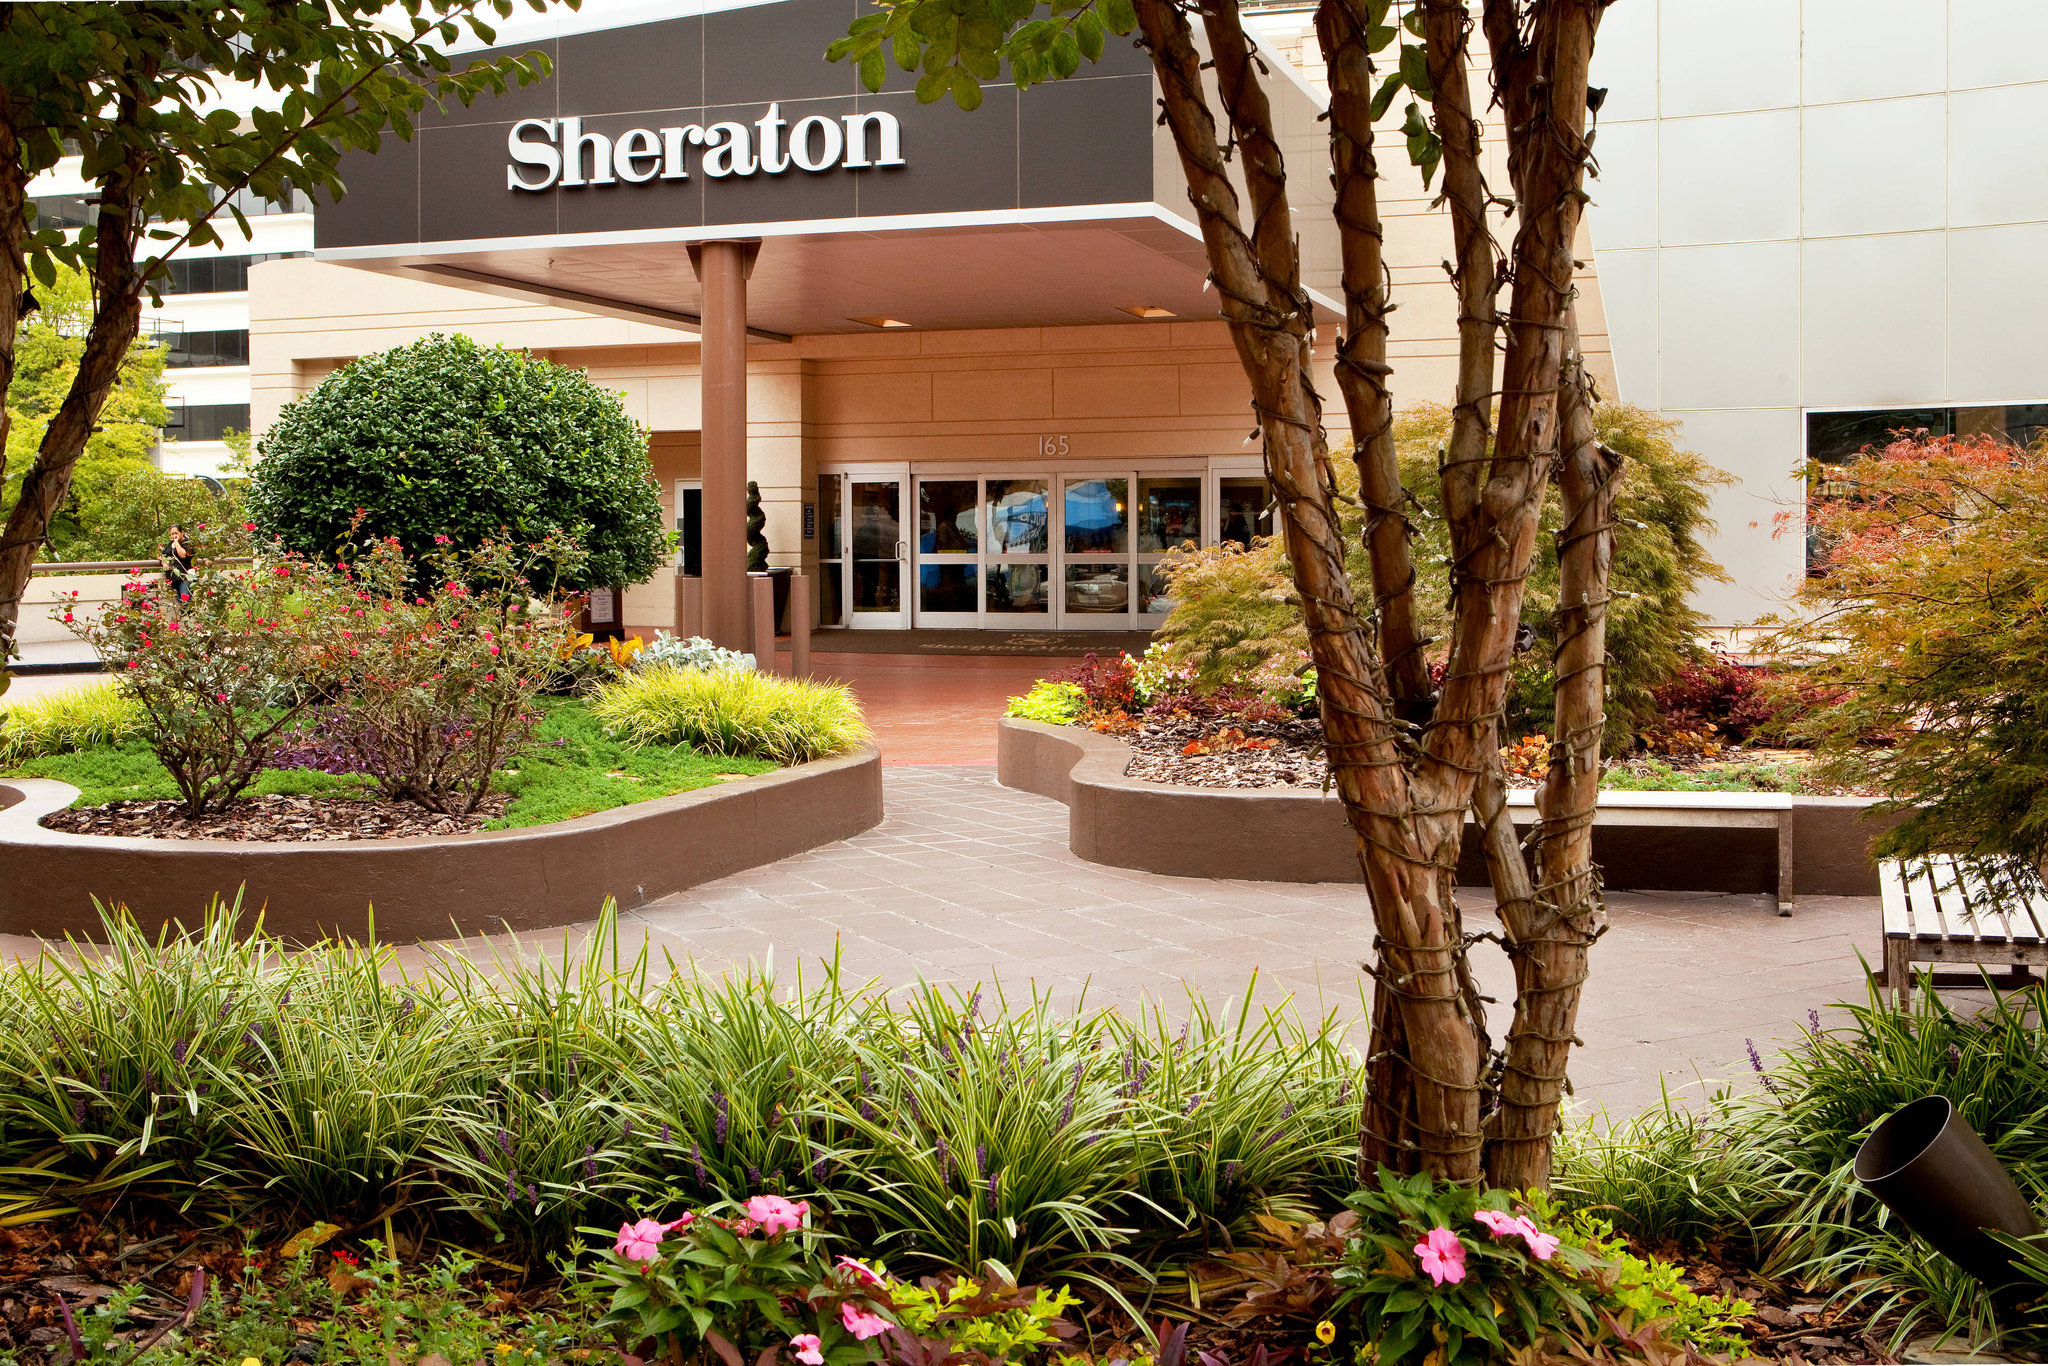 Sheraton Atlanta Hotel- First Class Atlanta, GA Hotels- GDS